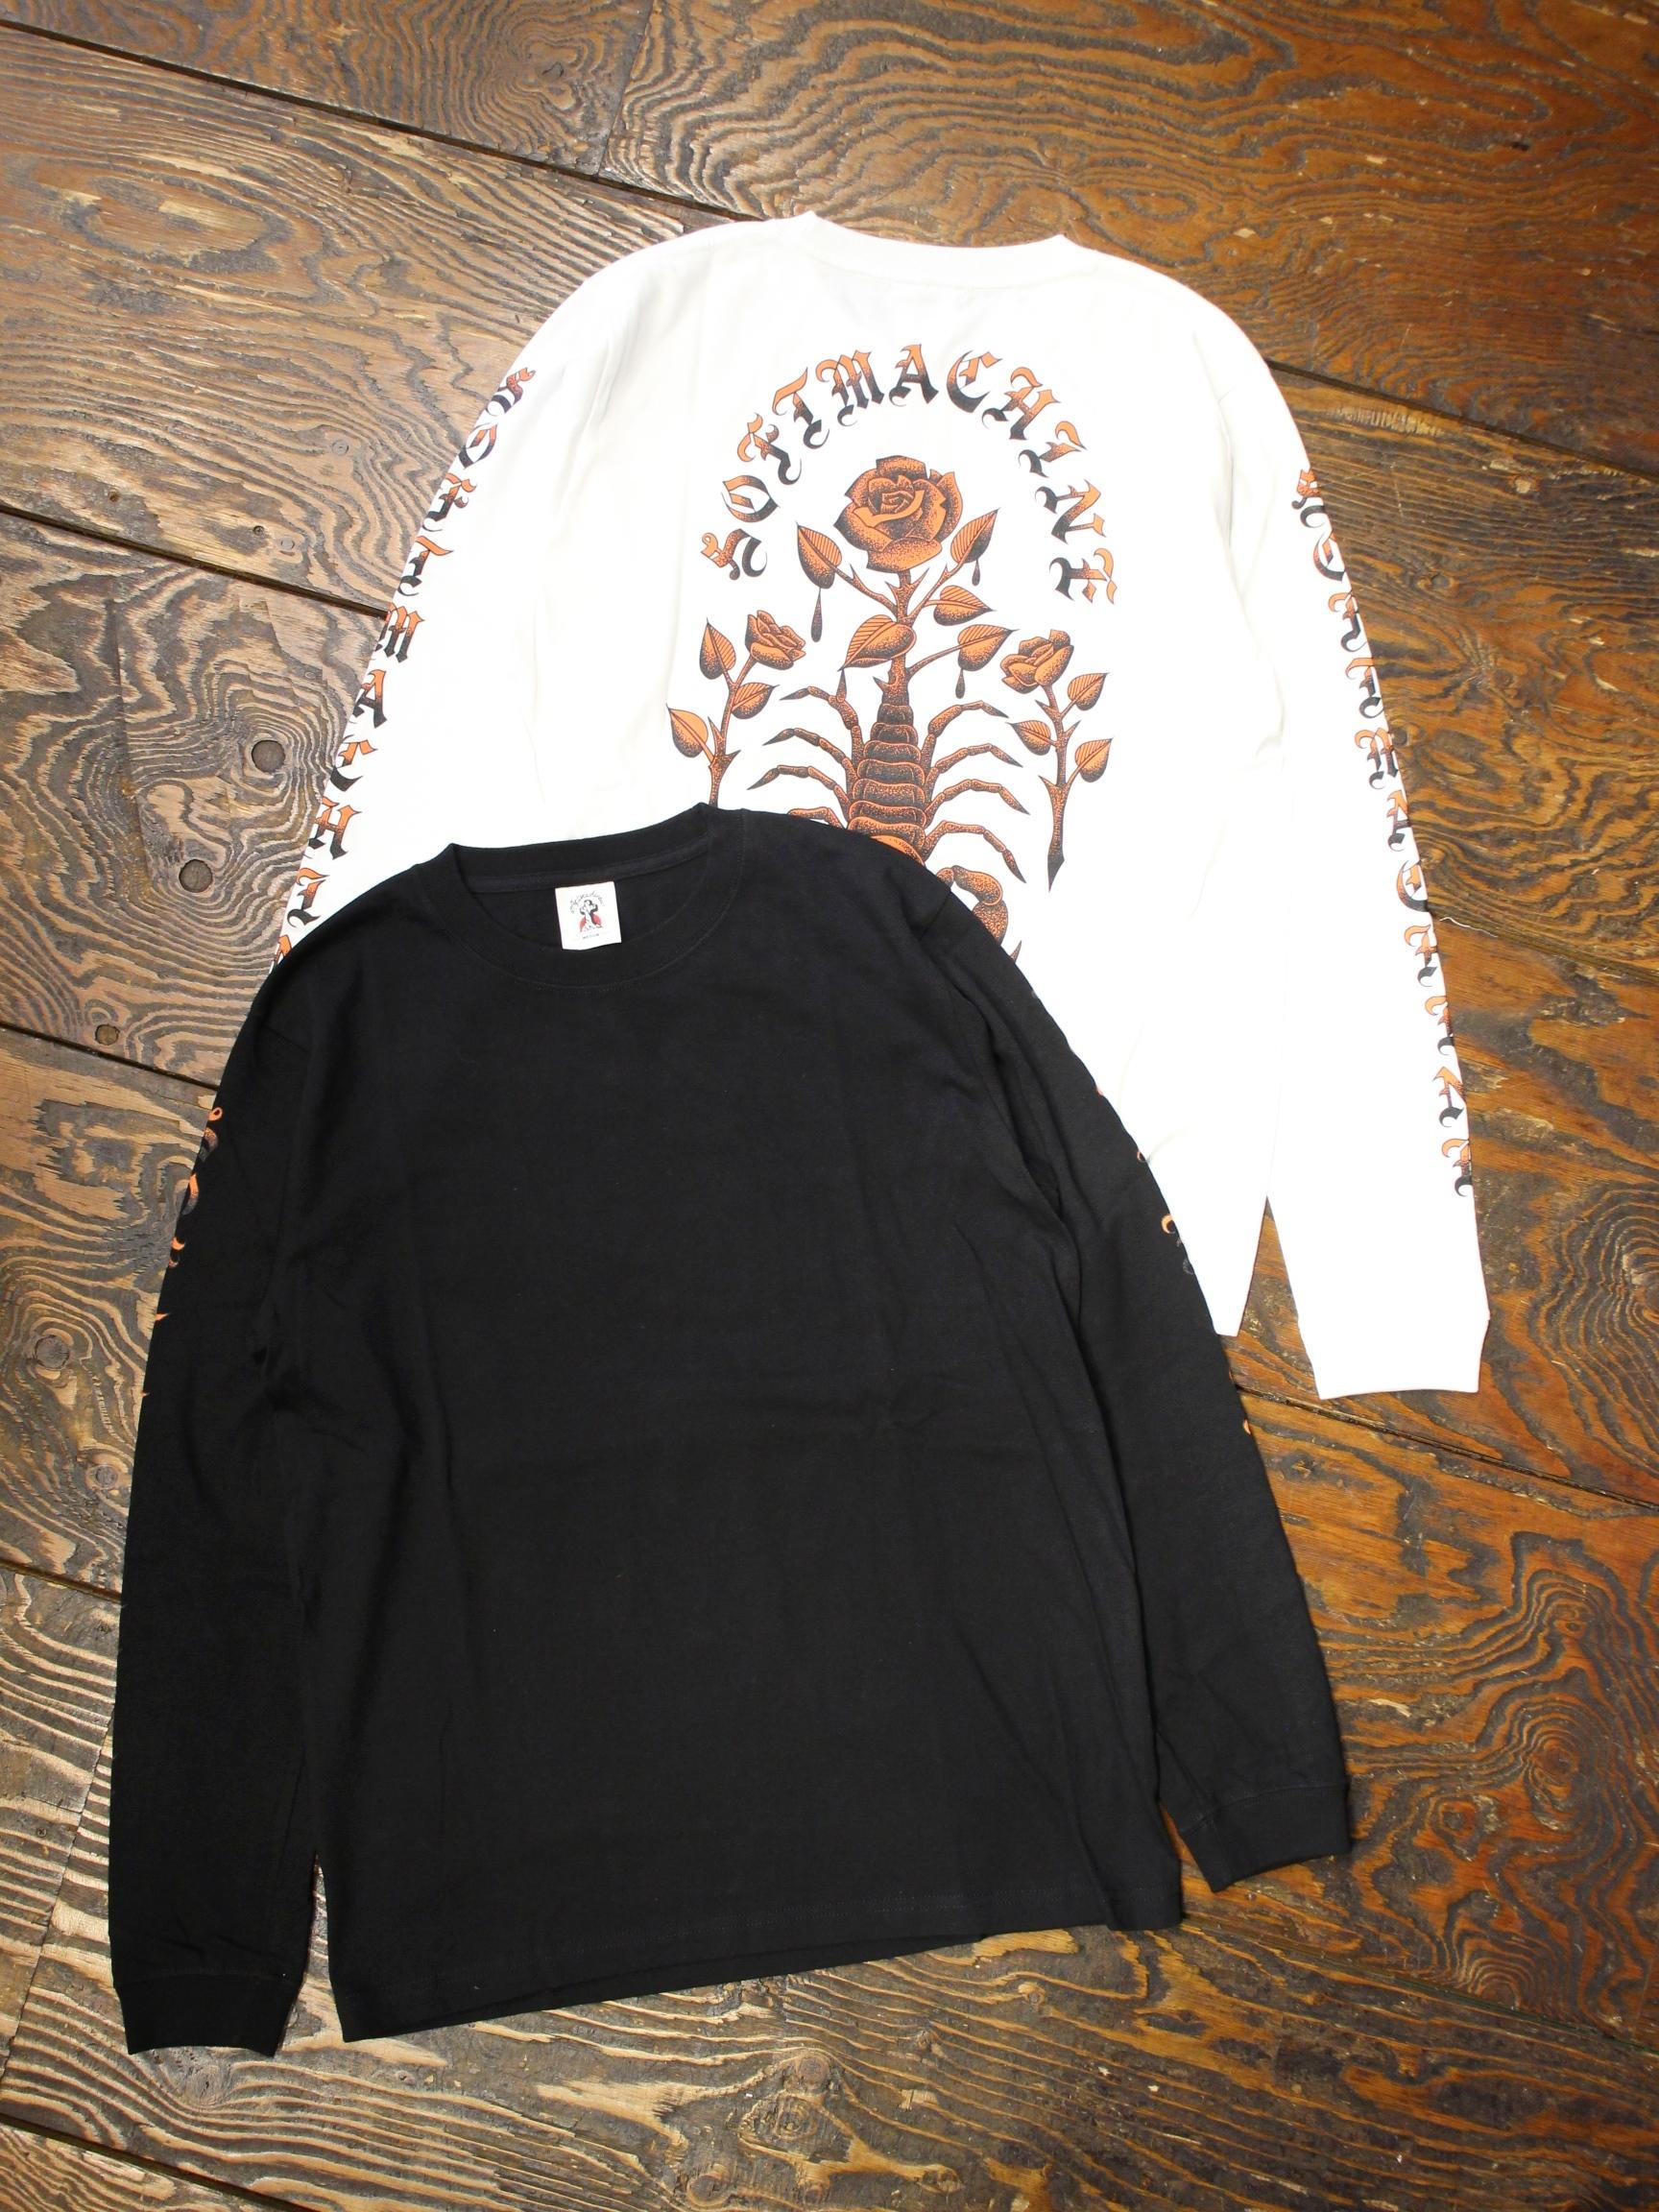 SOFTMACHINE  「POISON L/S」 ロングスリーブプリントティーシャツ